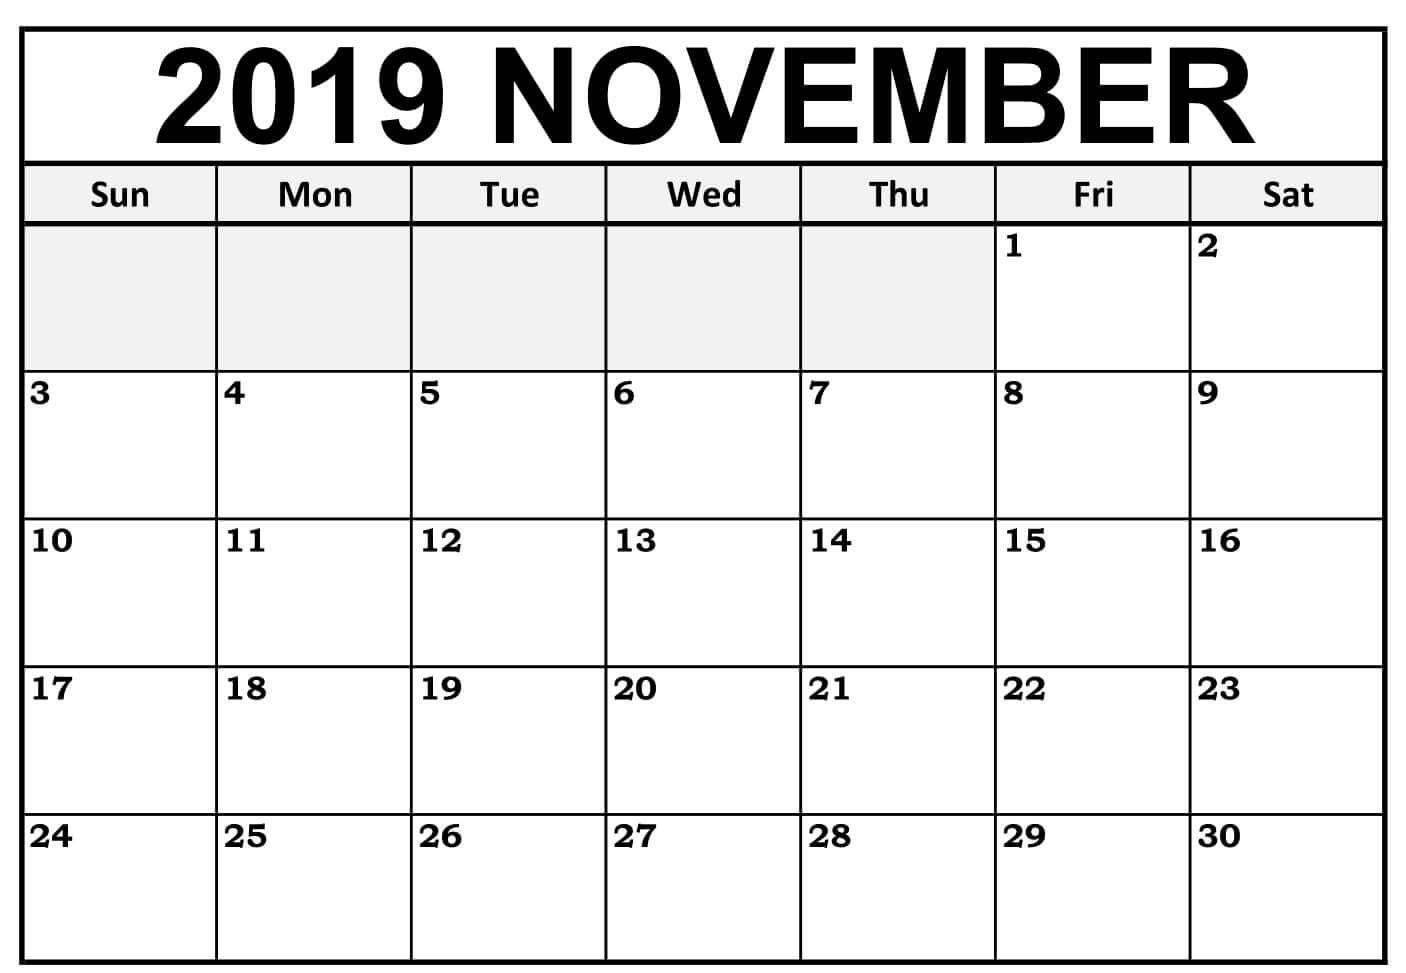 Blank November 2019 Calendar Editable